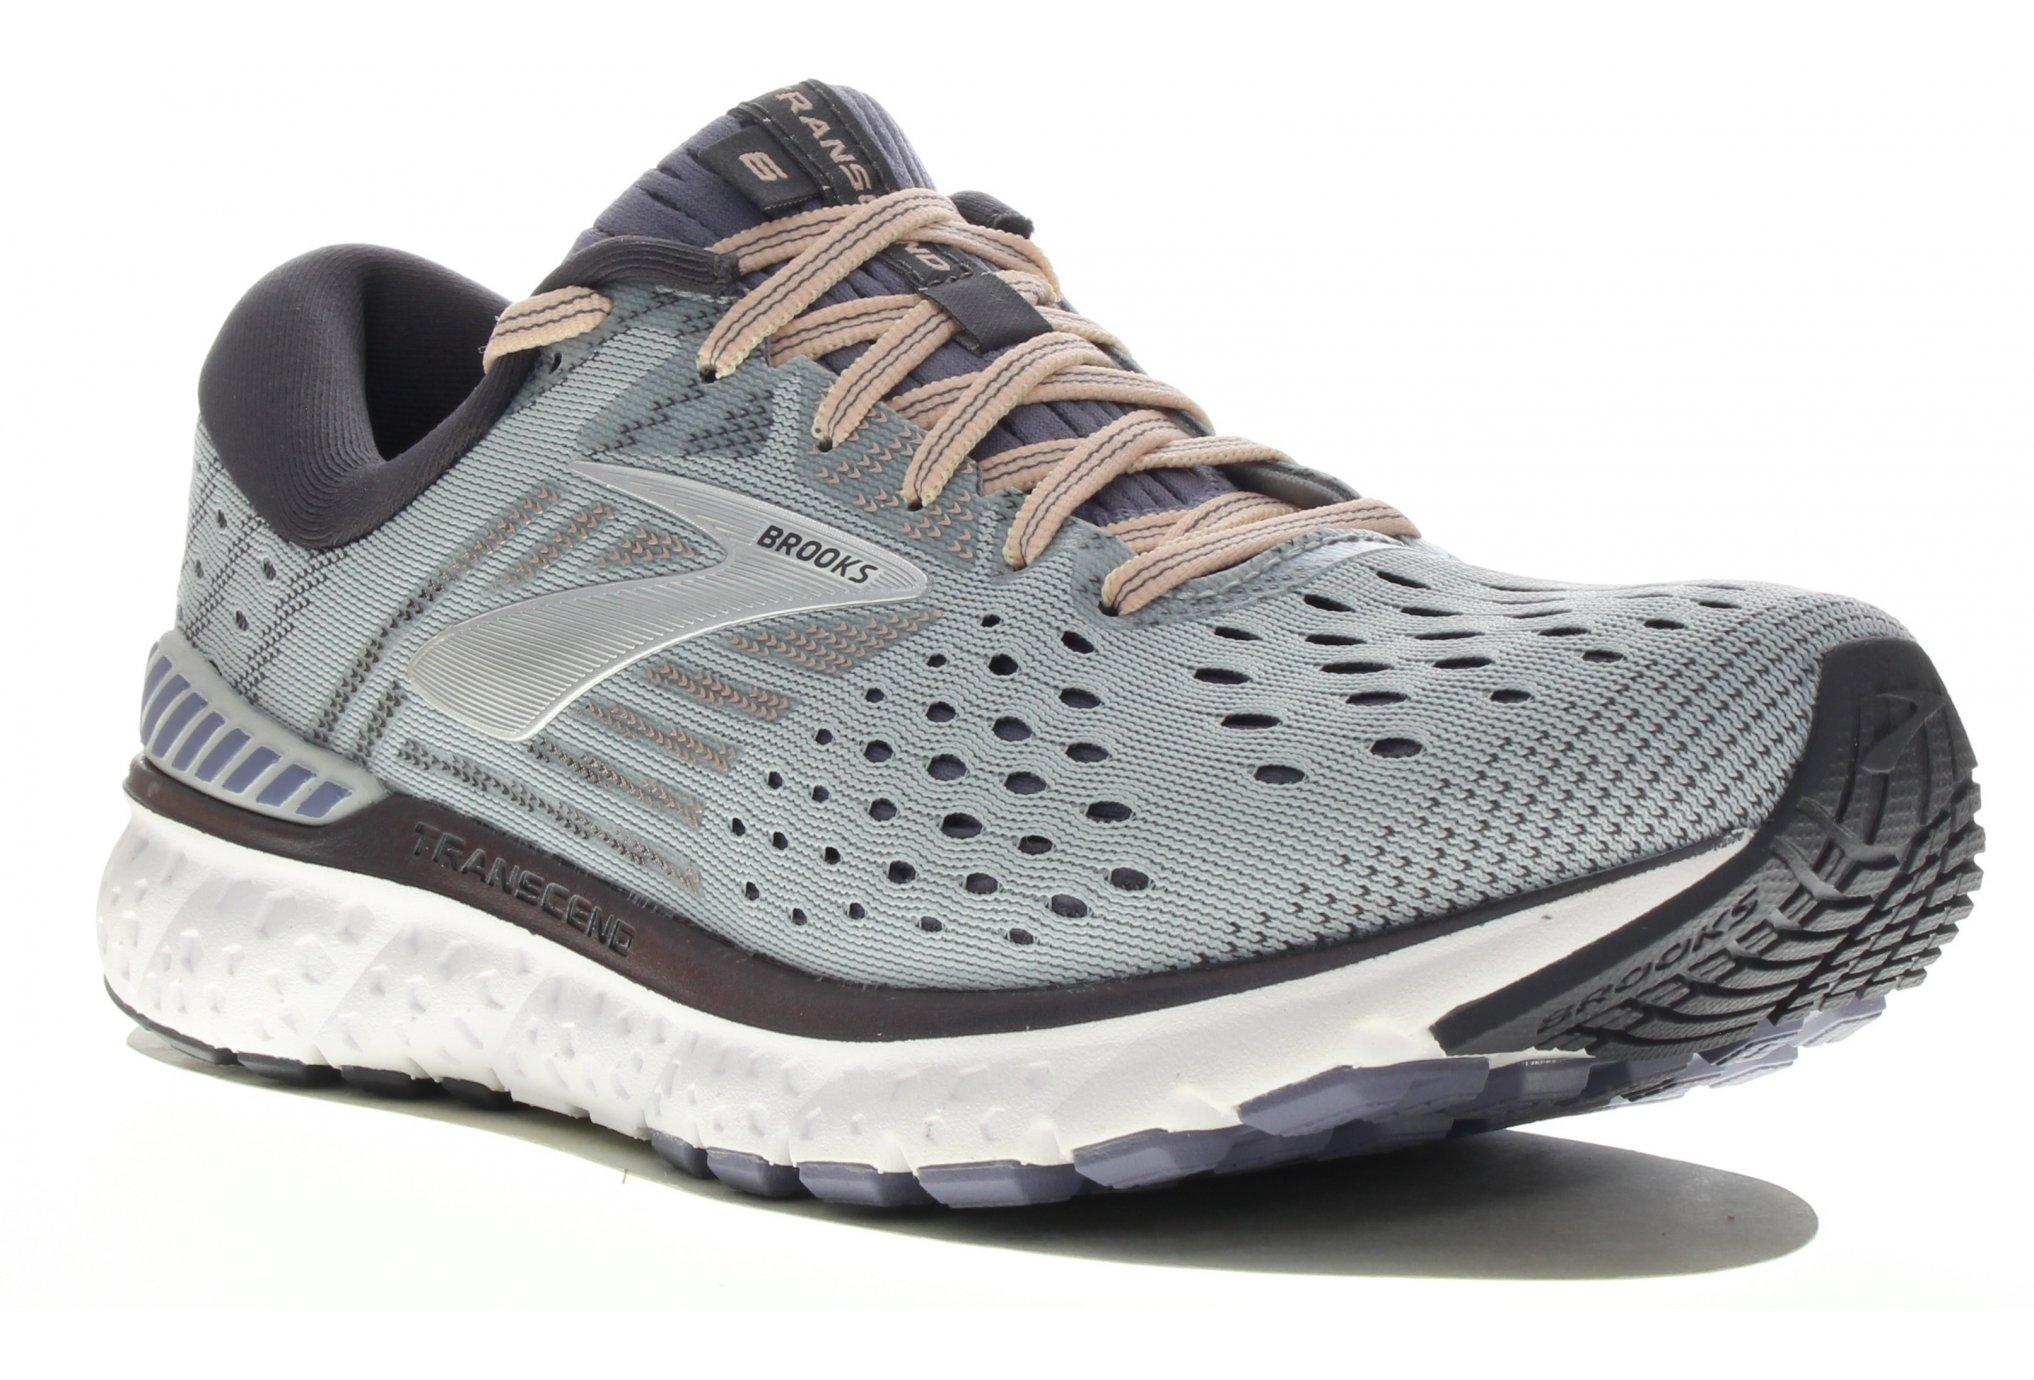 Brooks Transcend 6 Chaussures running femme